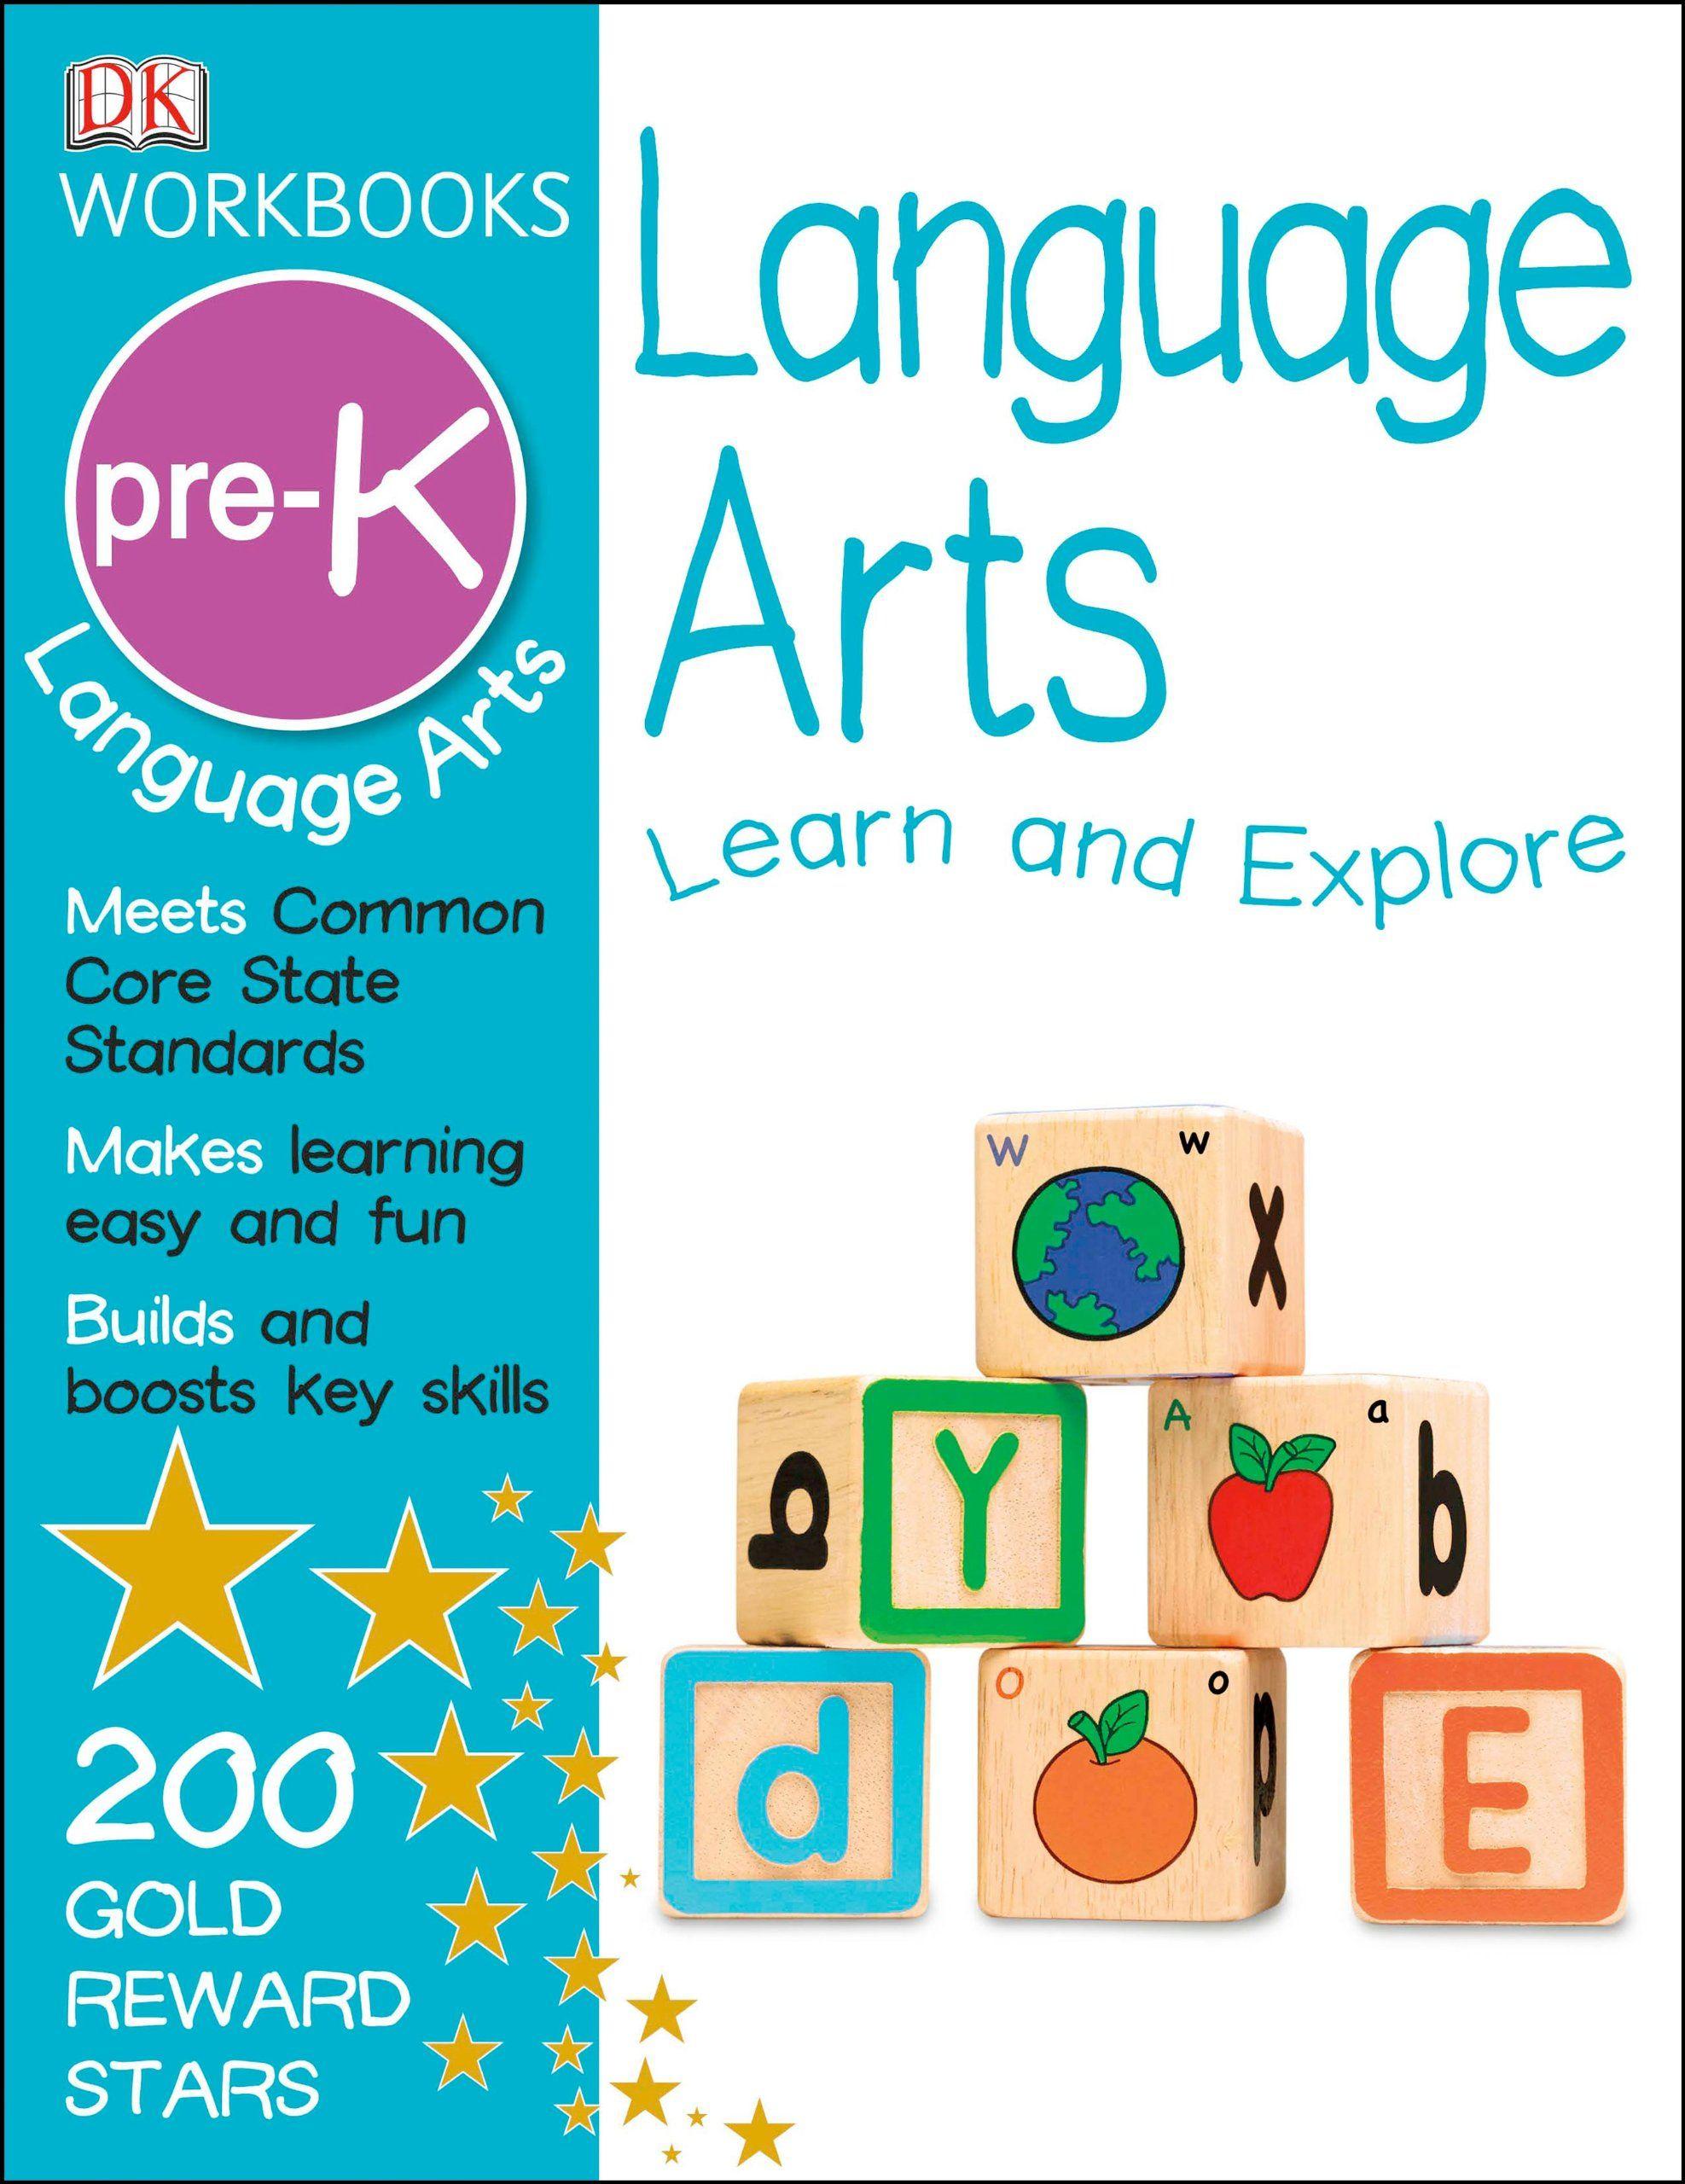 DK Workbooks: Language Arts, Pre-K Price:$6.99 | childhood book ...